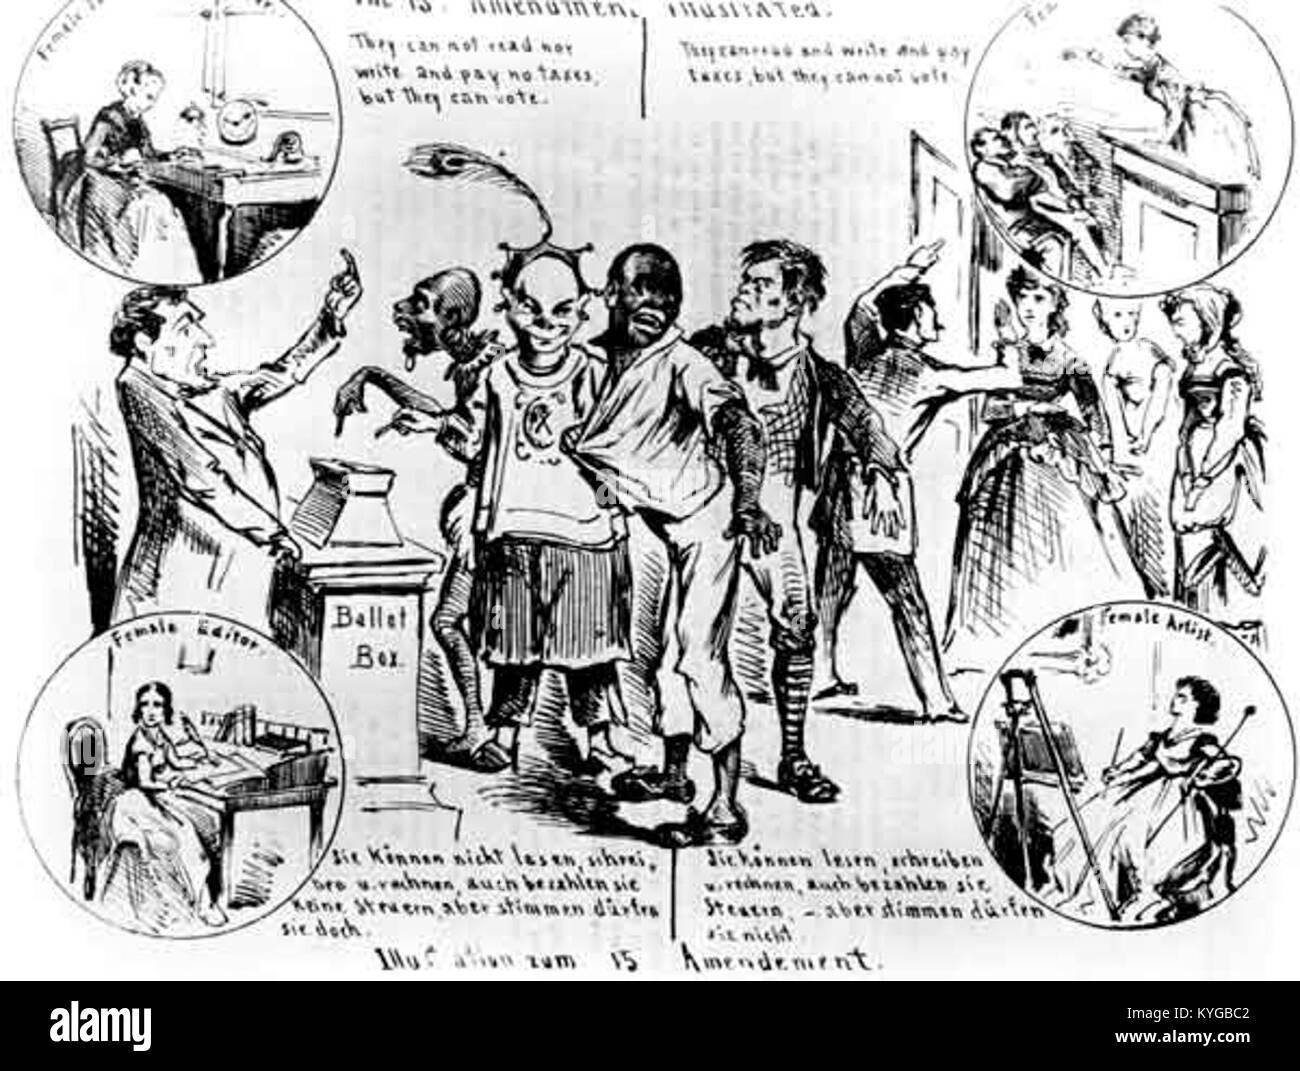 Womens Suffrage Cartoon Stock Photos Amp Womens Suffrage